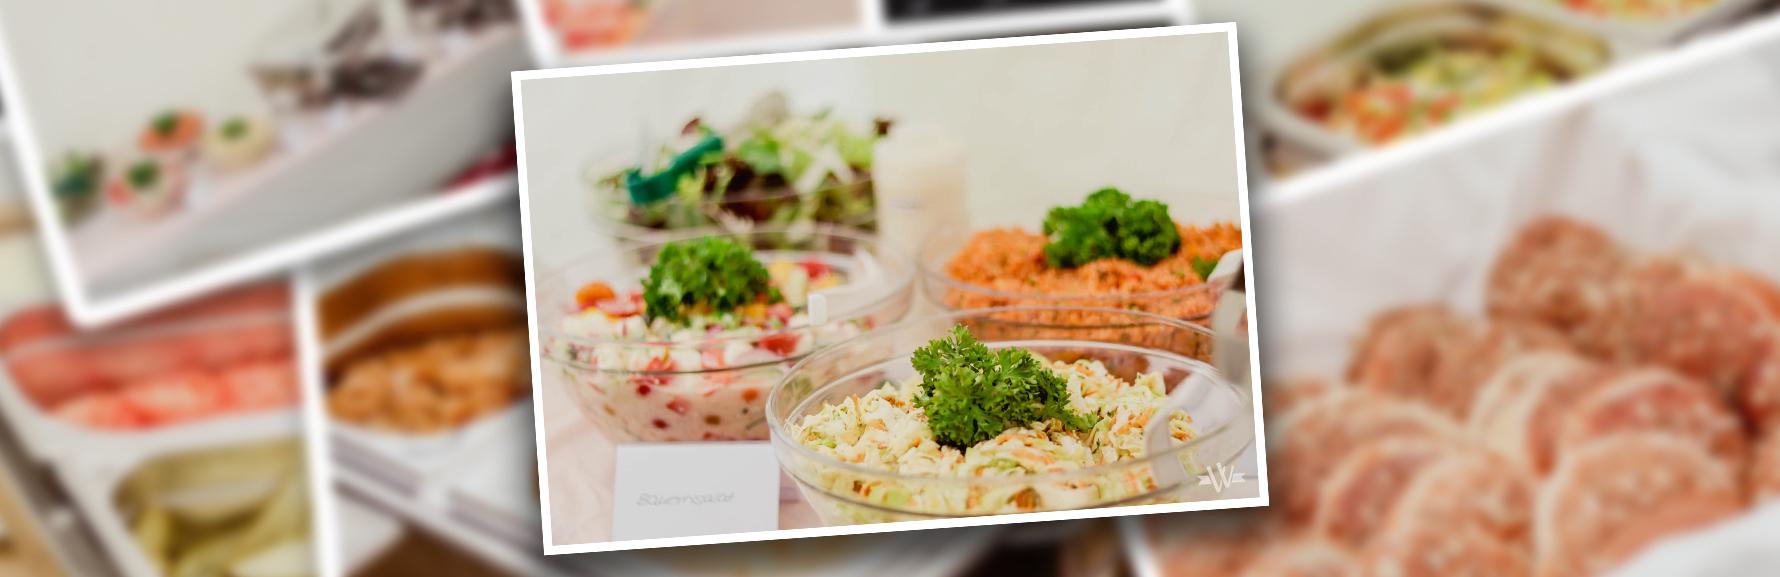 Eskinivvach Burferbuffet   Catering